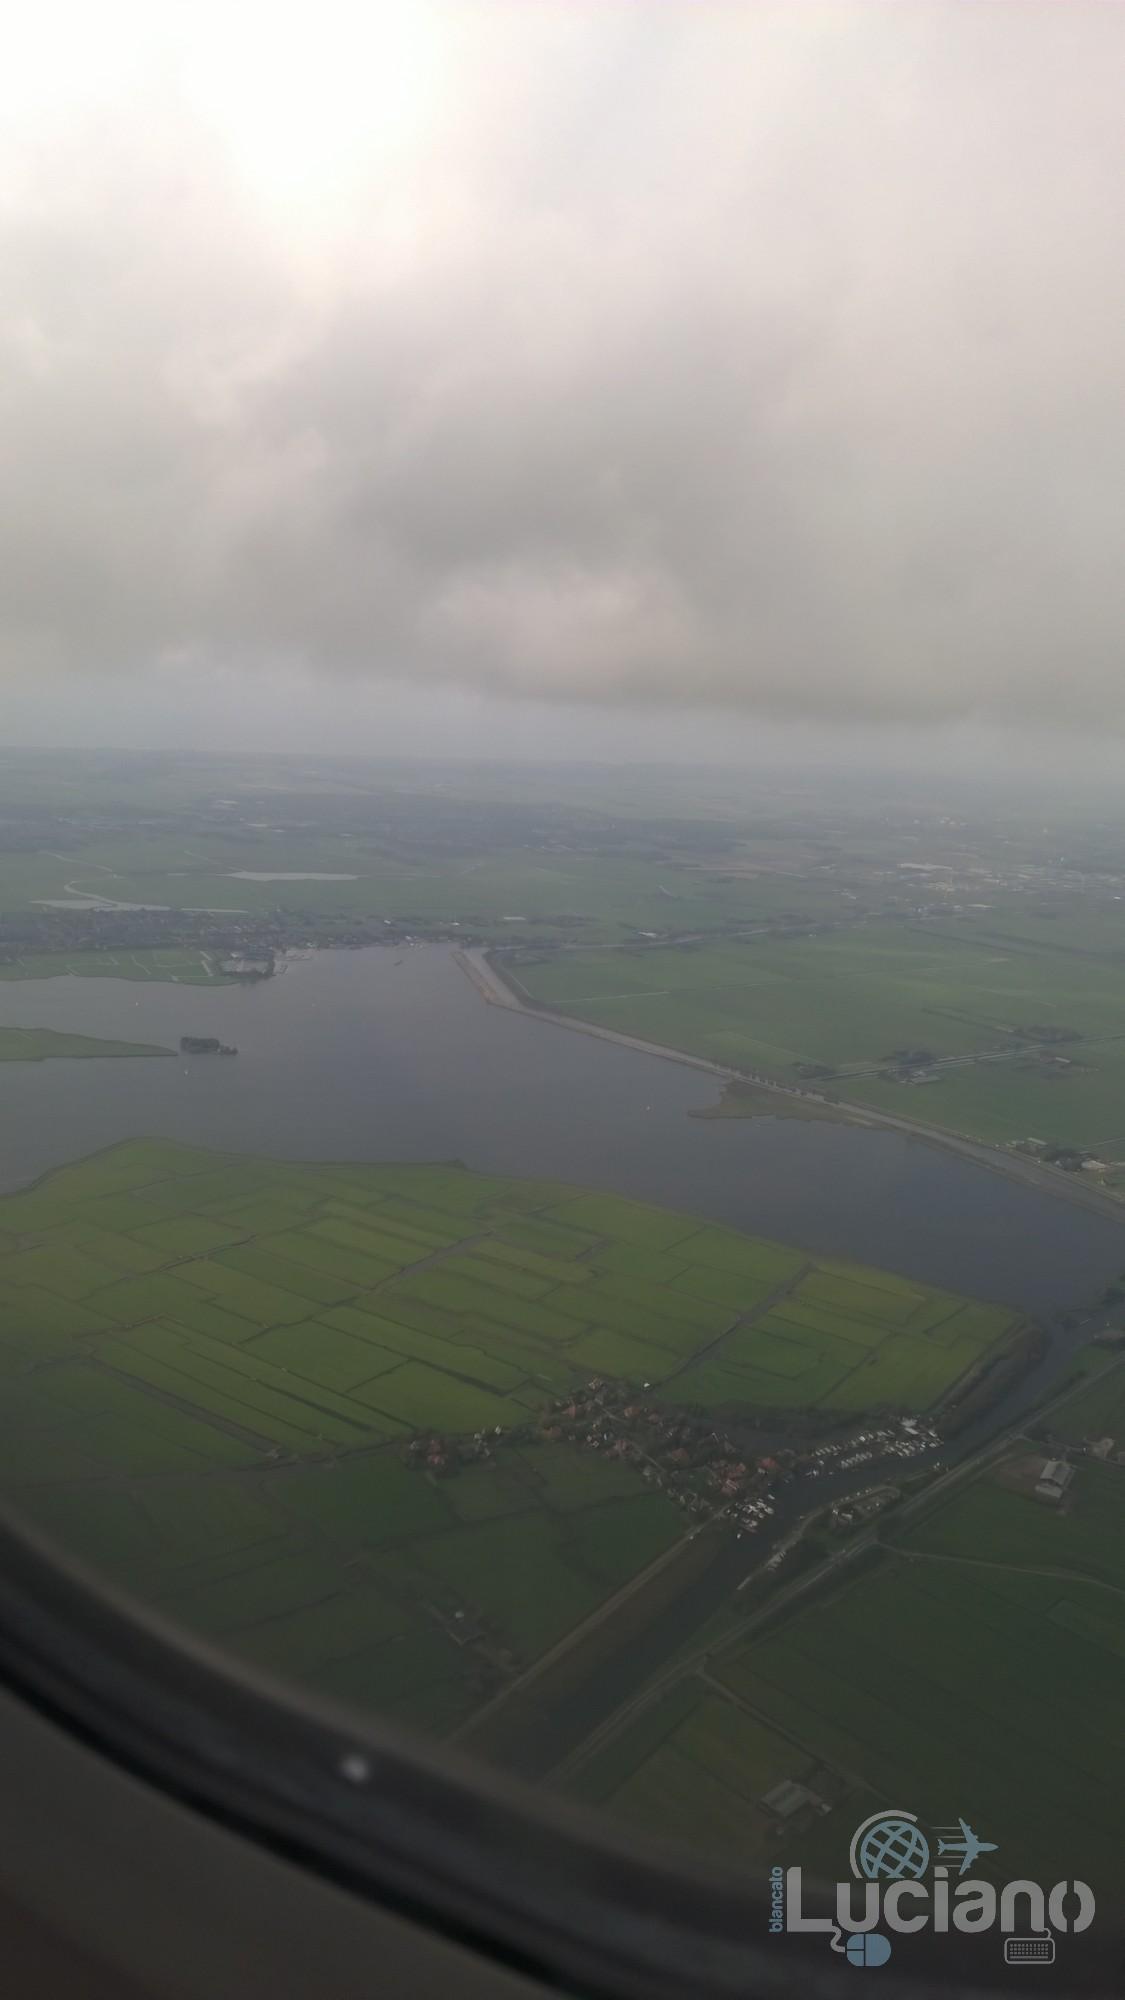 amsterdam-2014-vueling-lucianoblancatoit (11)